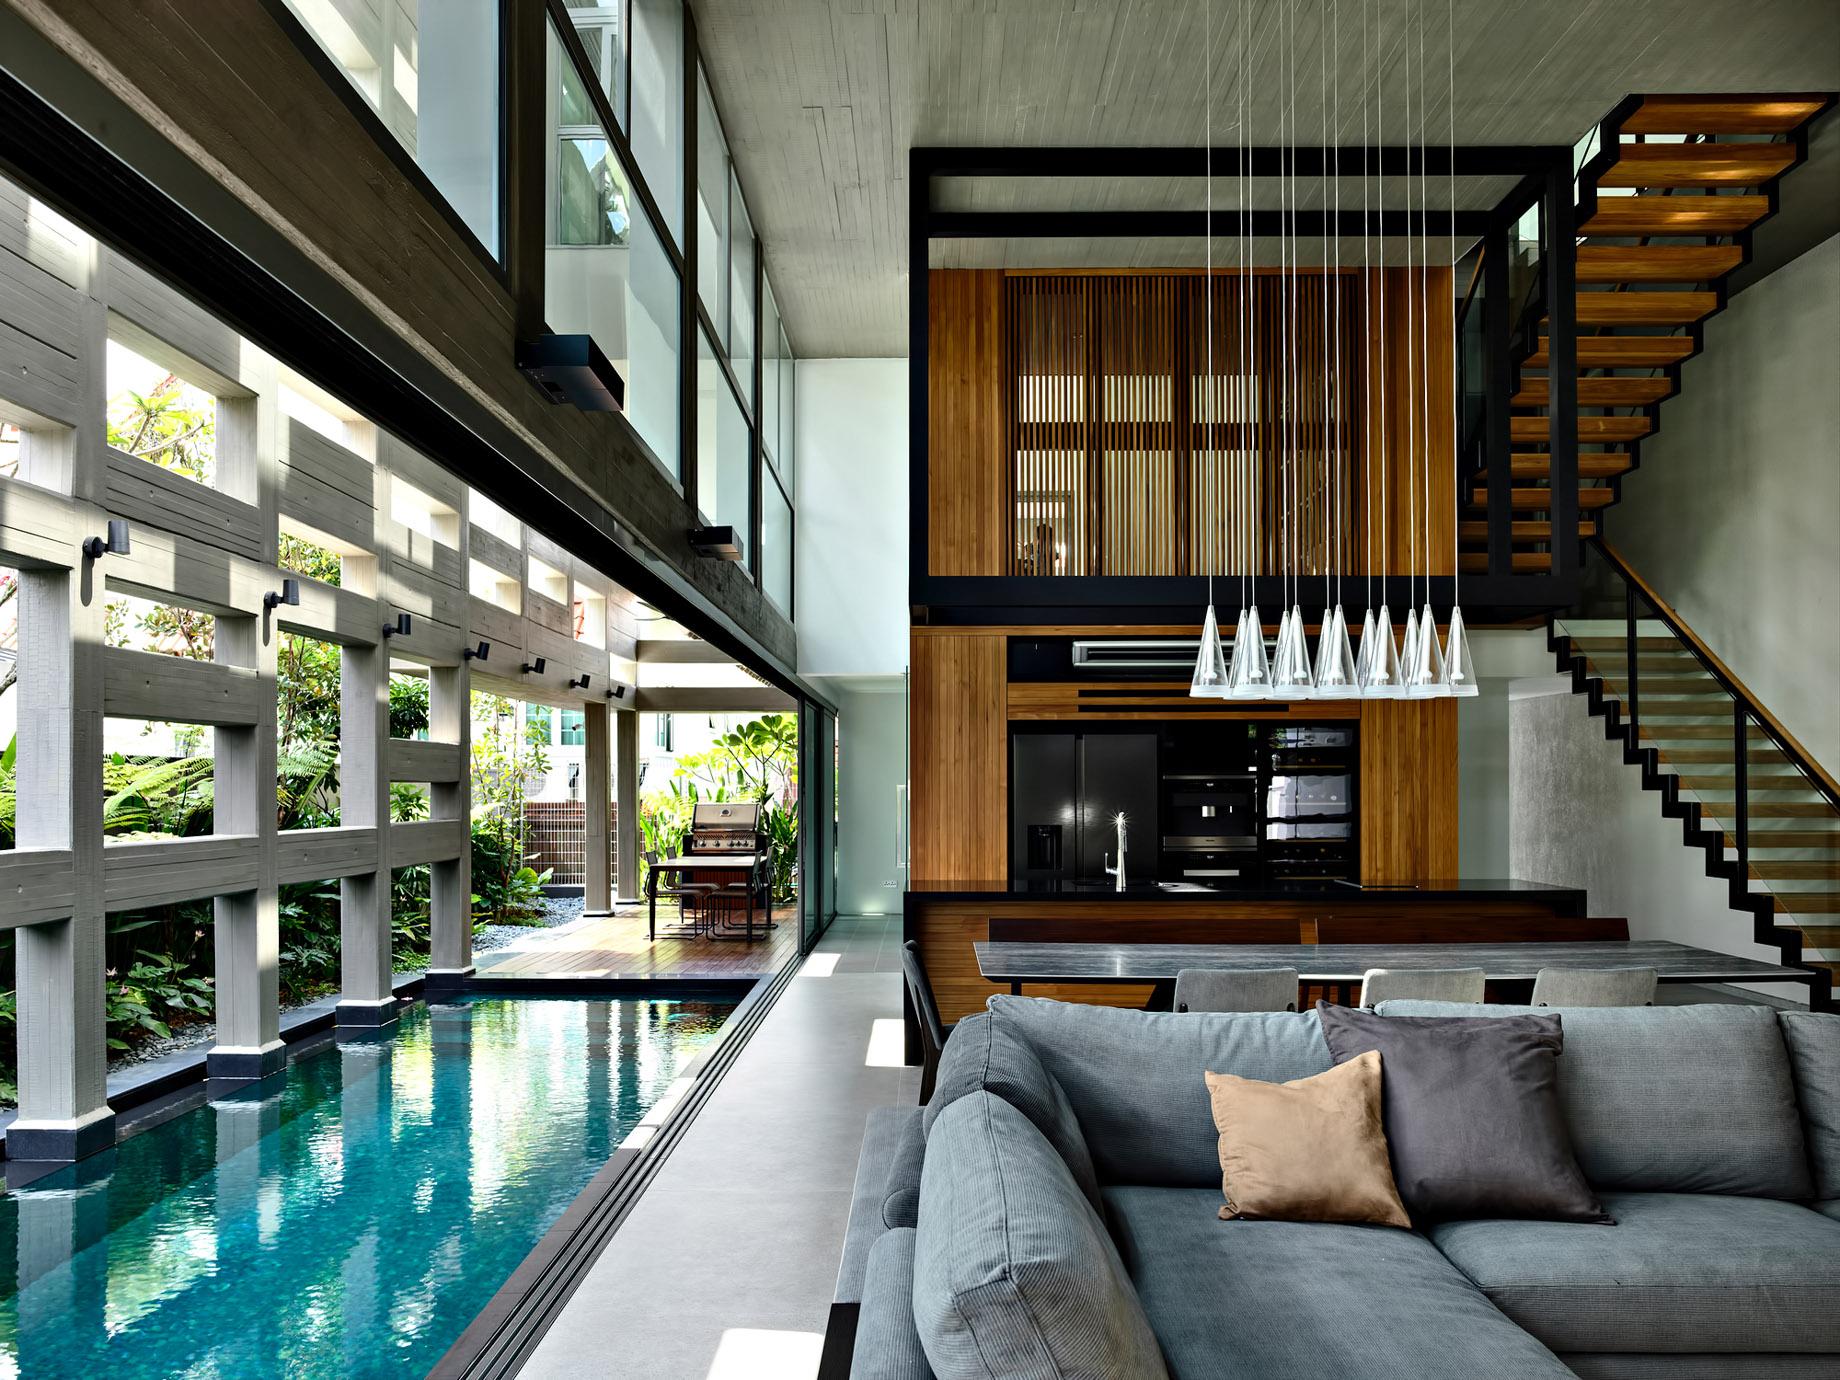 Concrete Light House Residence – Greenleaf Drive, Singapore